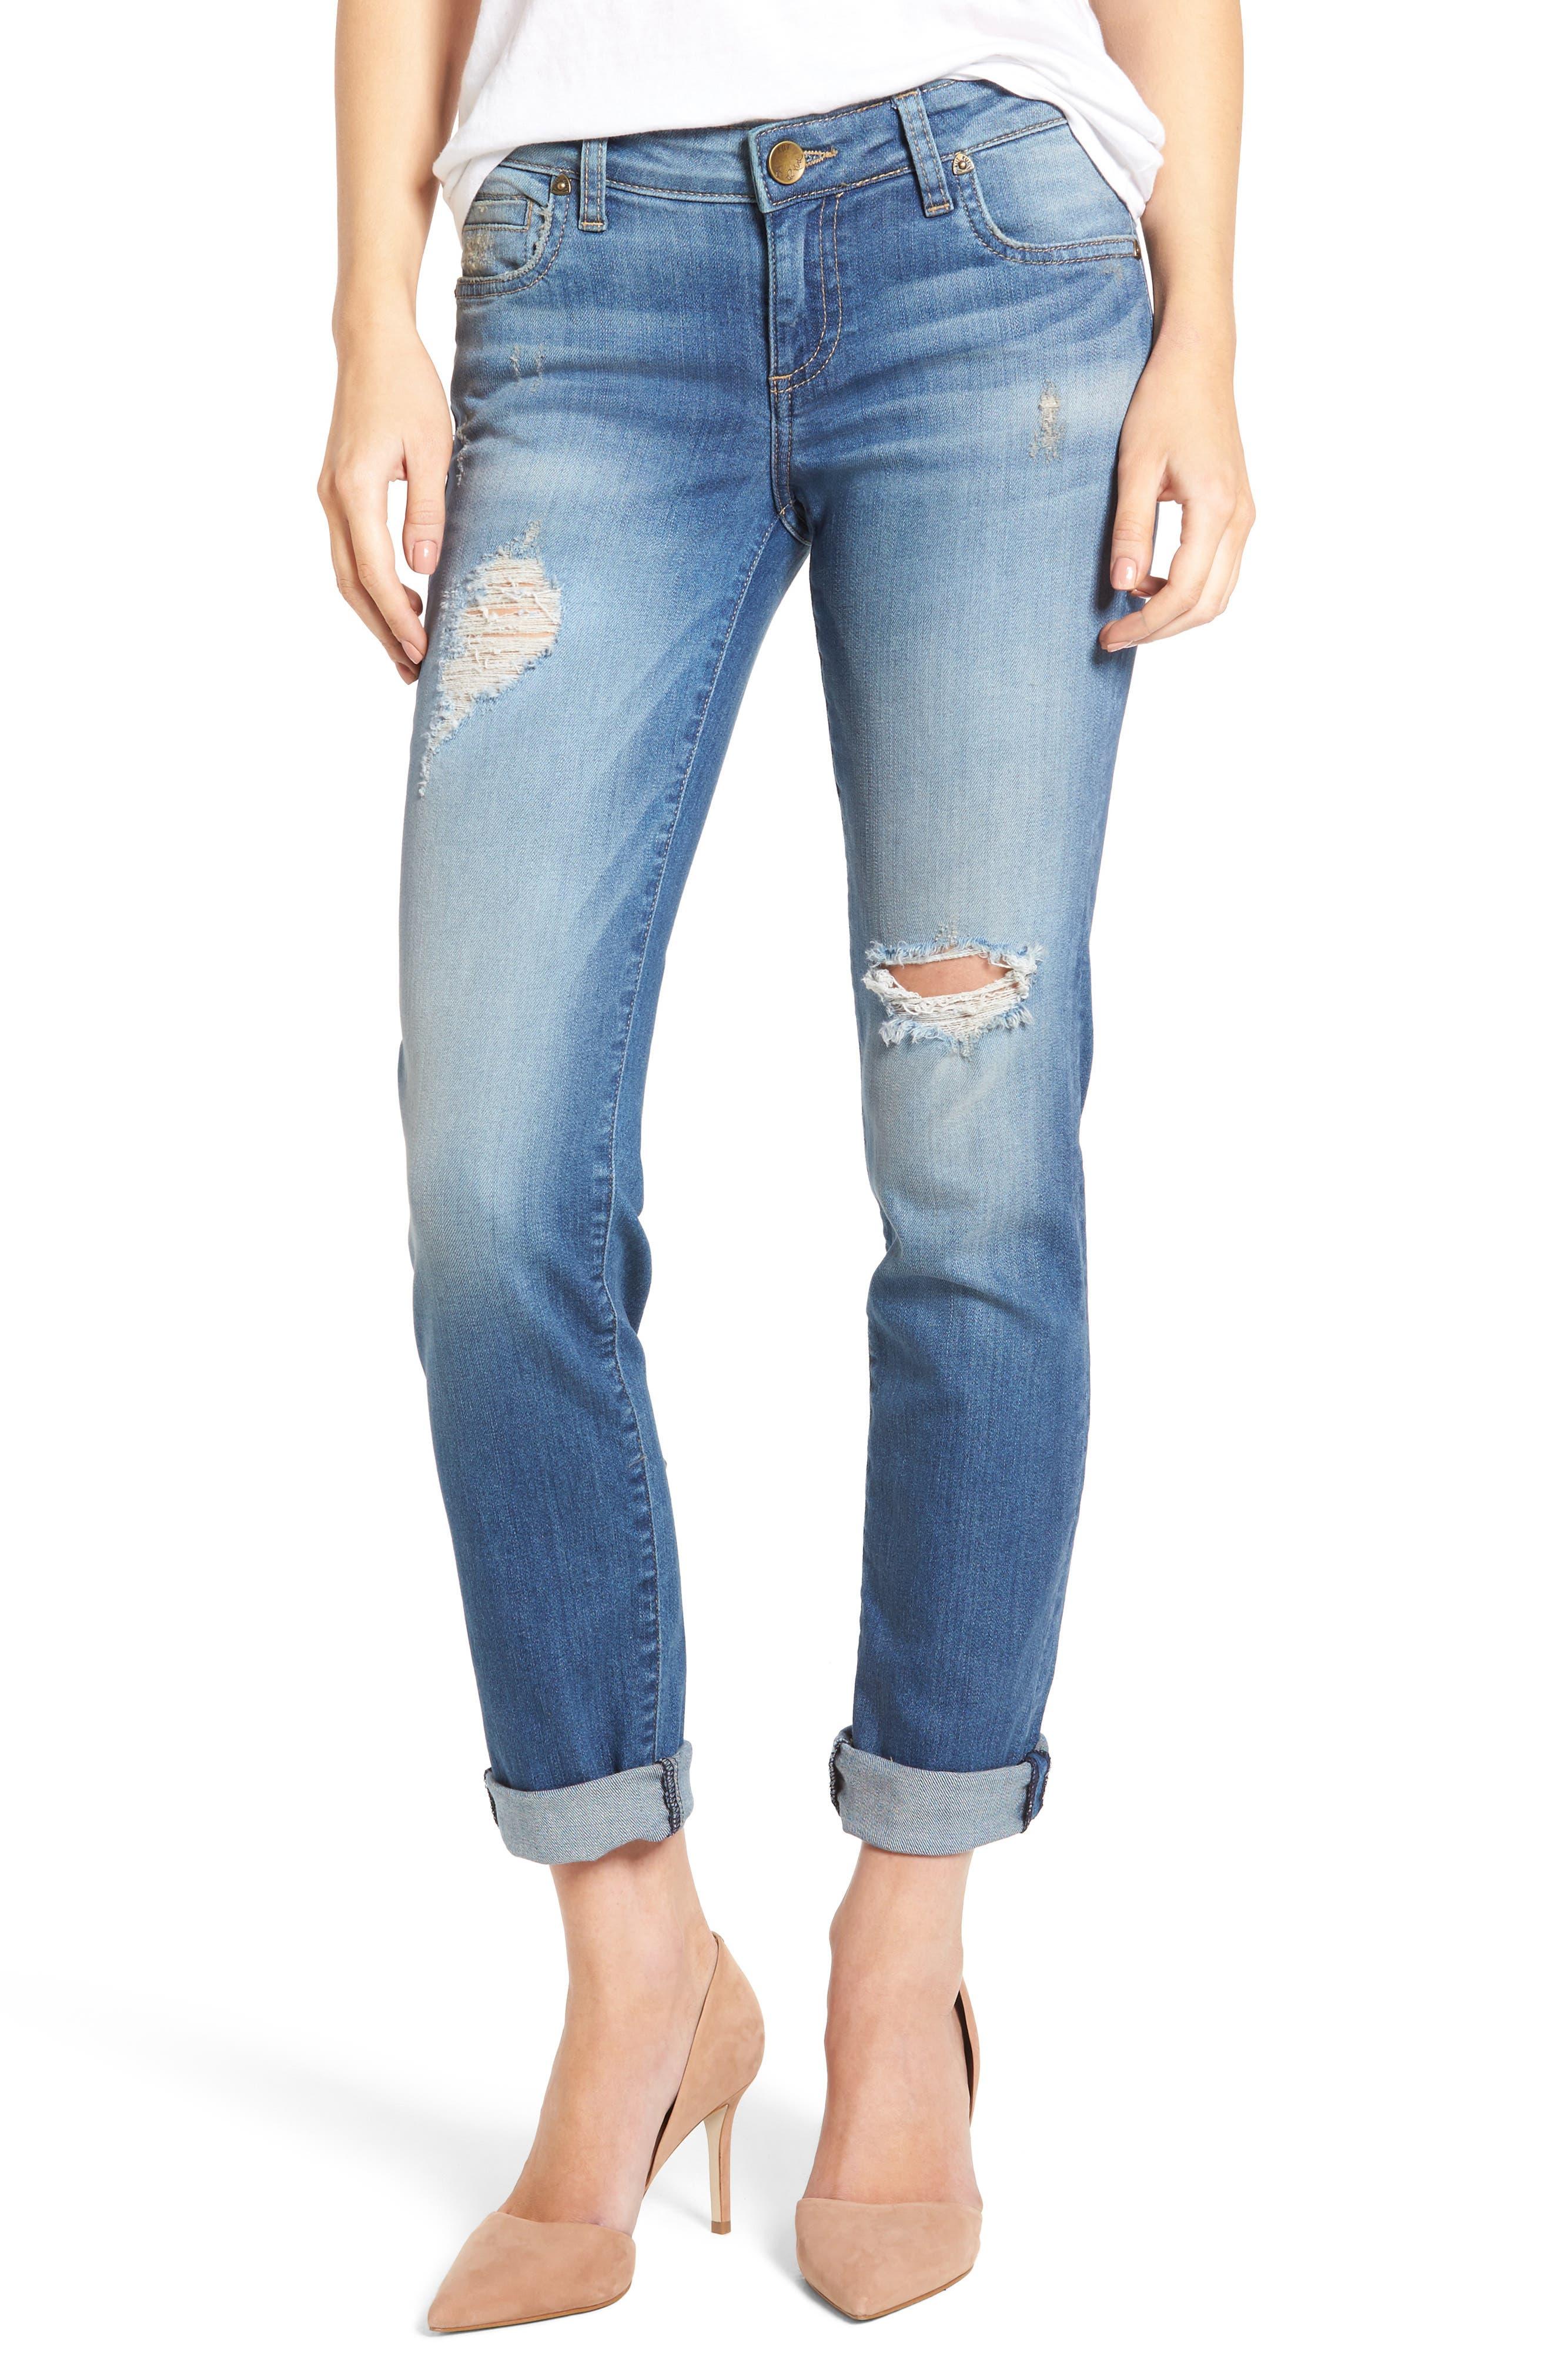 Main Image - KUT from the Kloth Catherine Distressed Boyfriend Jeans (Fiery) (Regular & Petite)